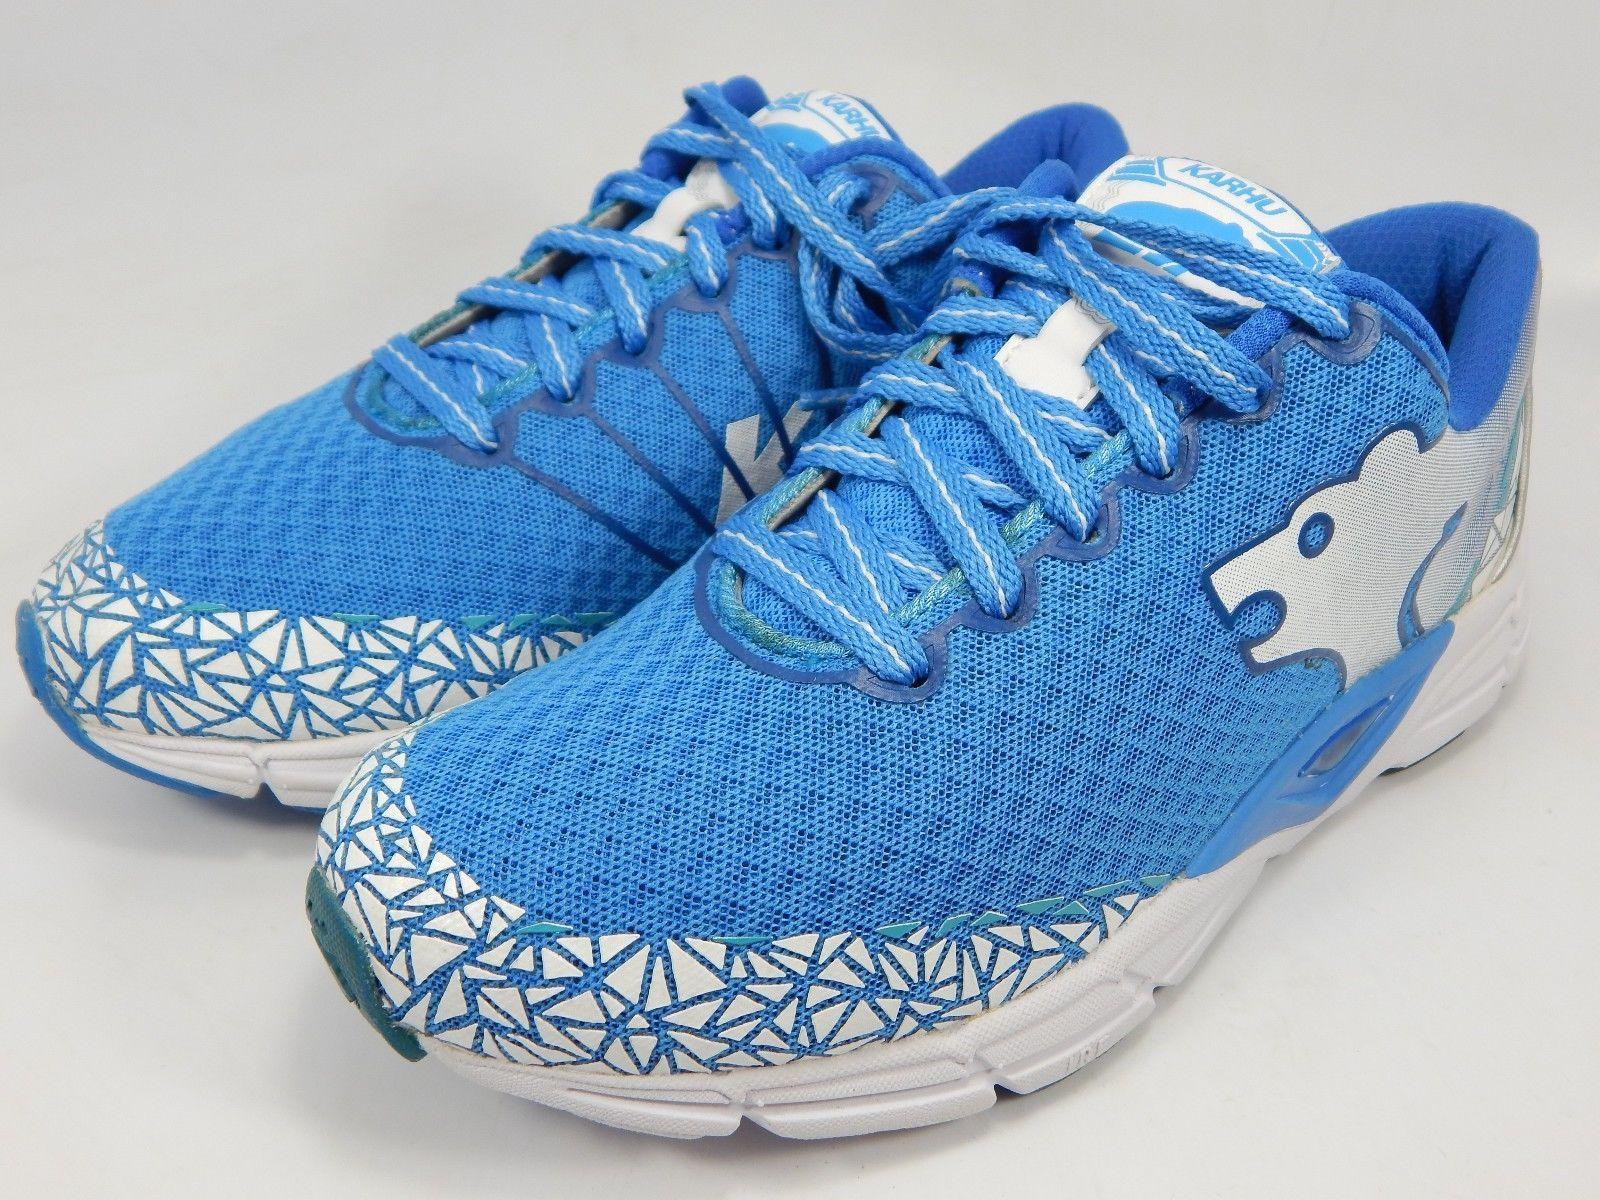 Karhu 2016 Flow 6 IRE Fulcrum Women's Running Shoes Size US 7 M (B) EU 38 Blue